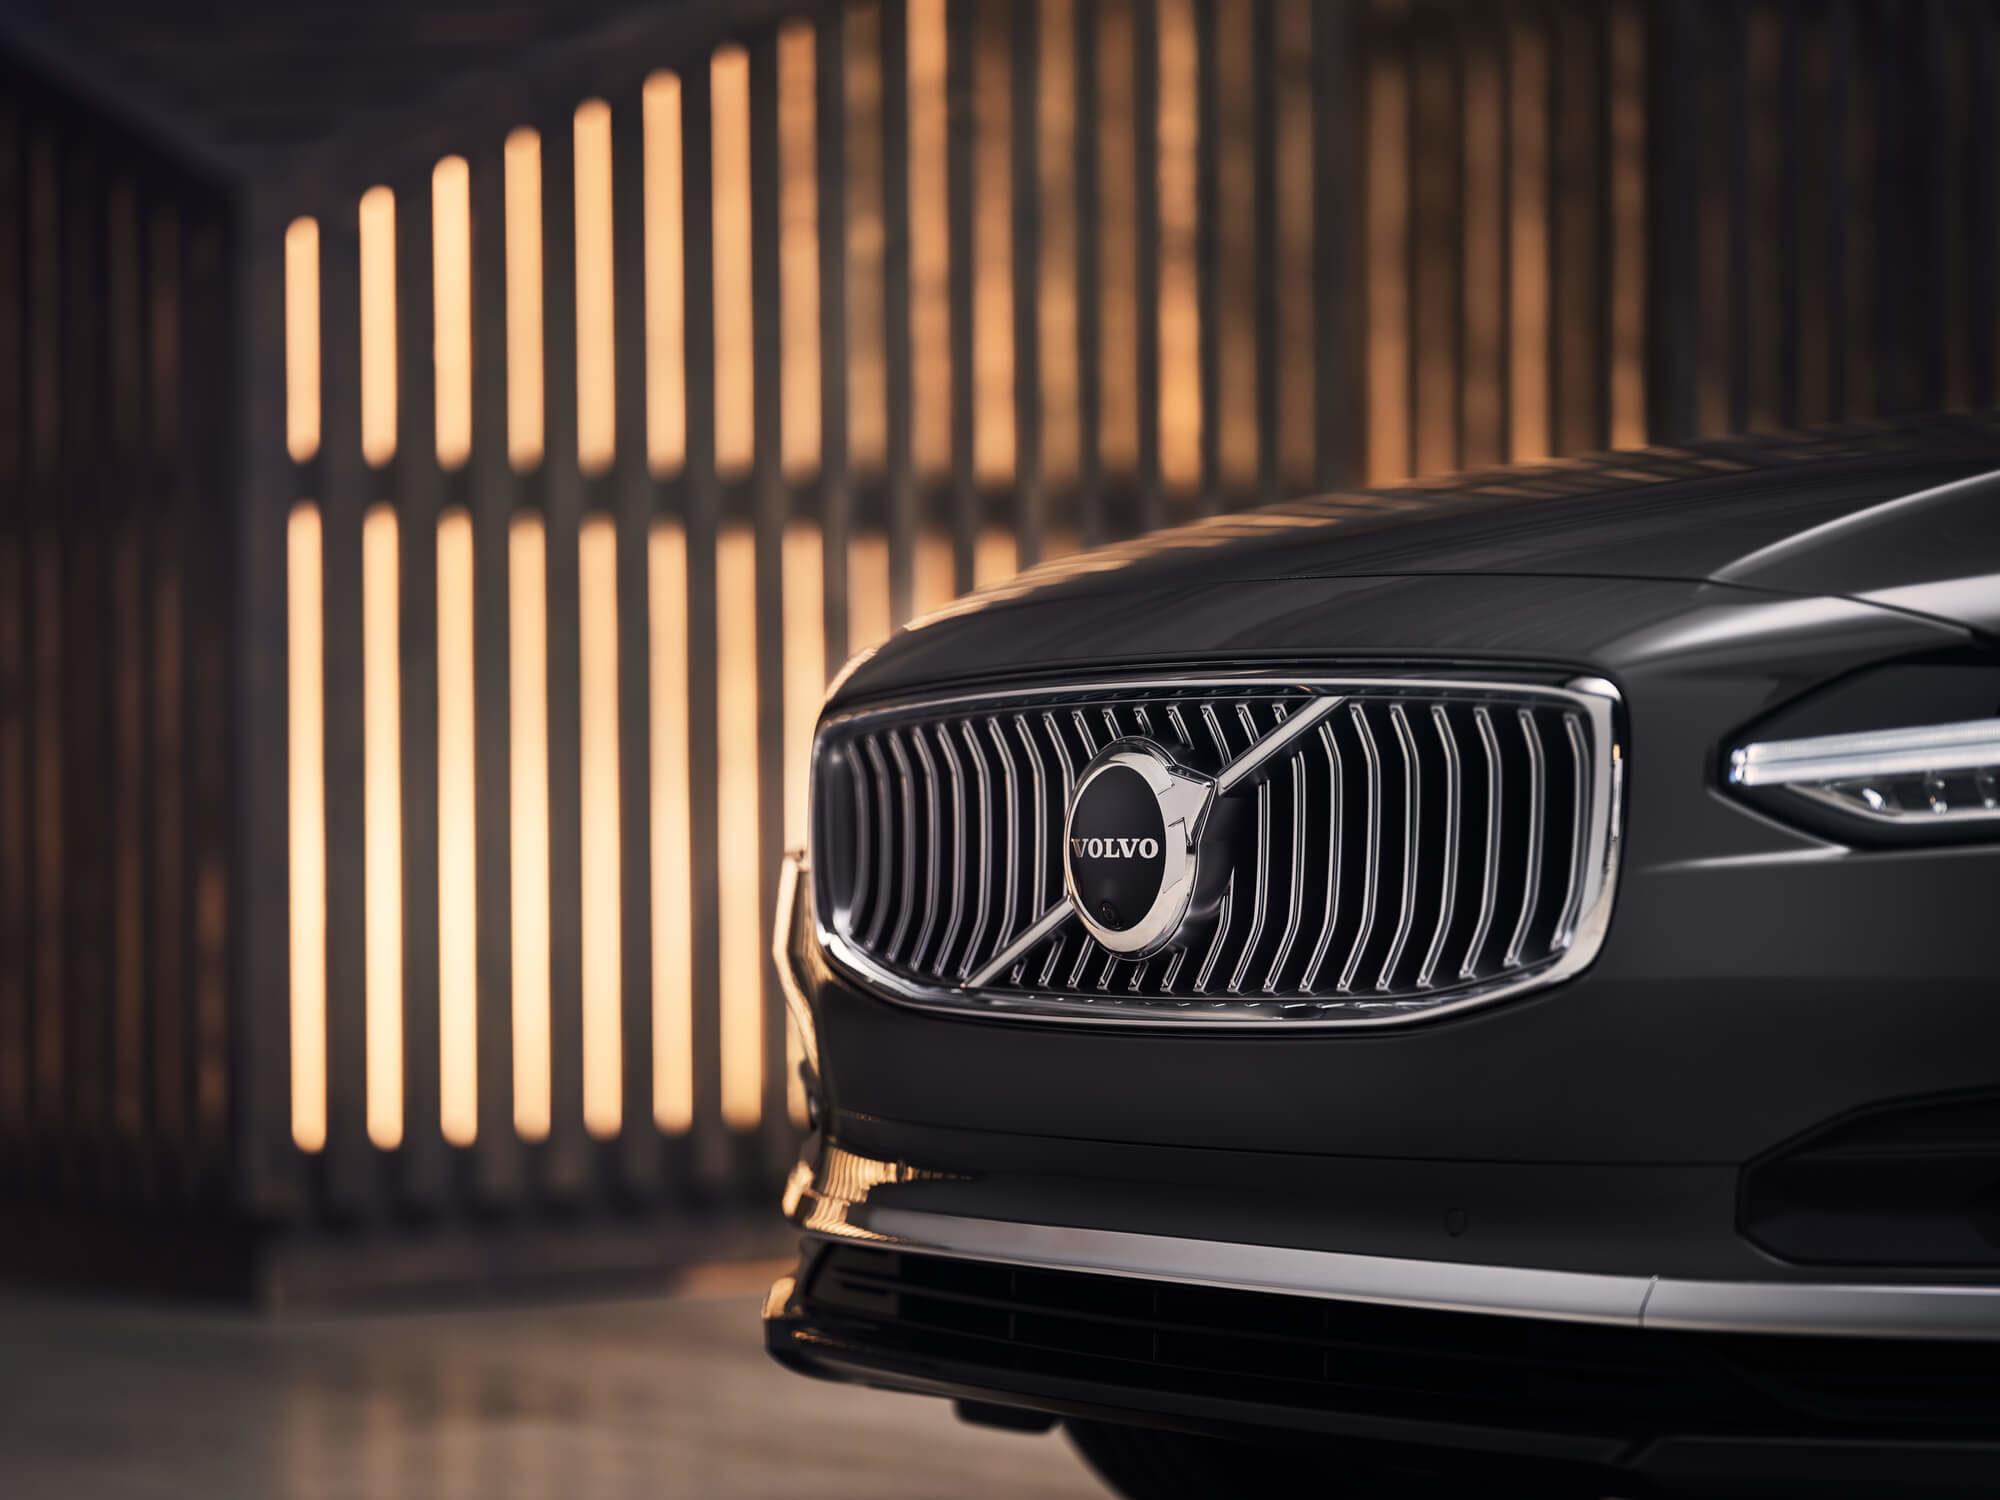 Volvo V90 voorbumper